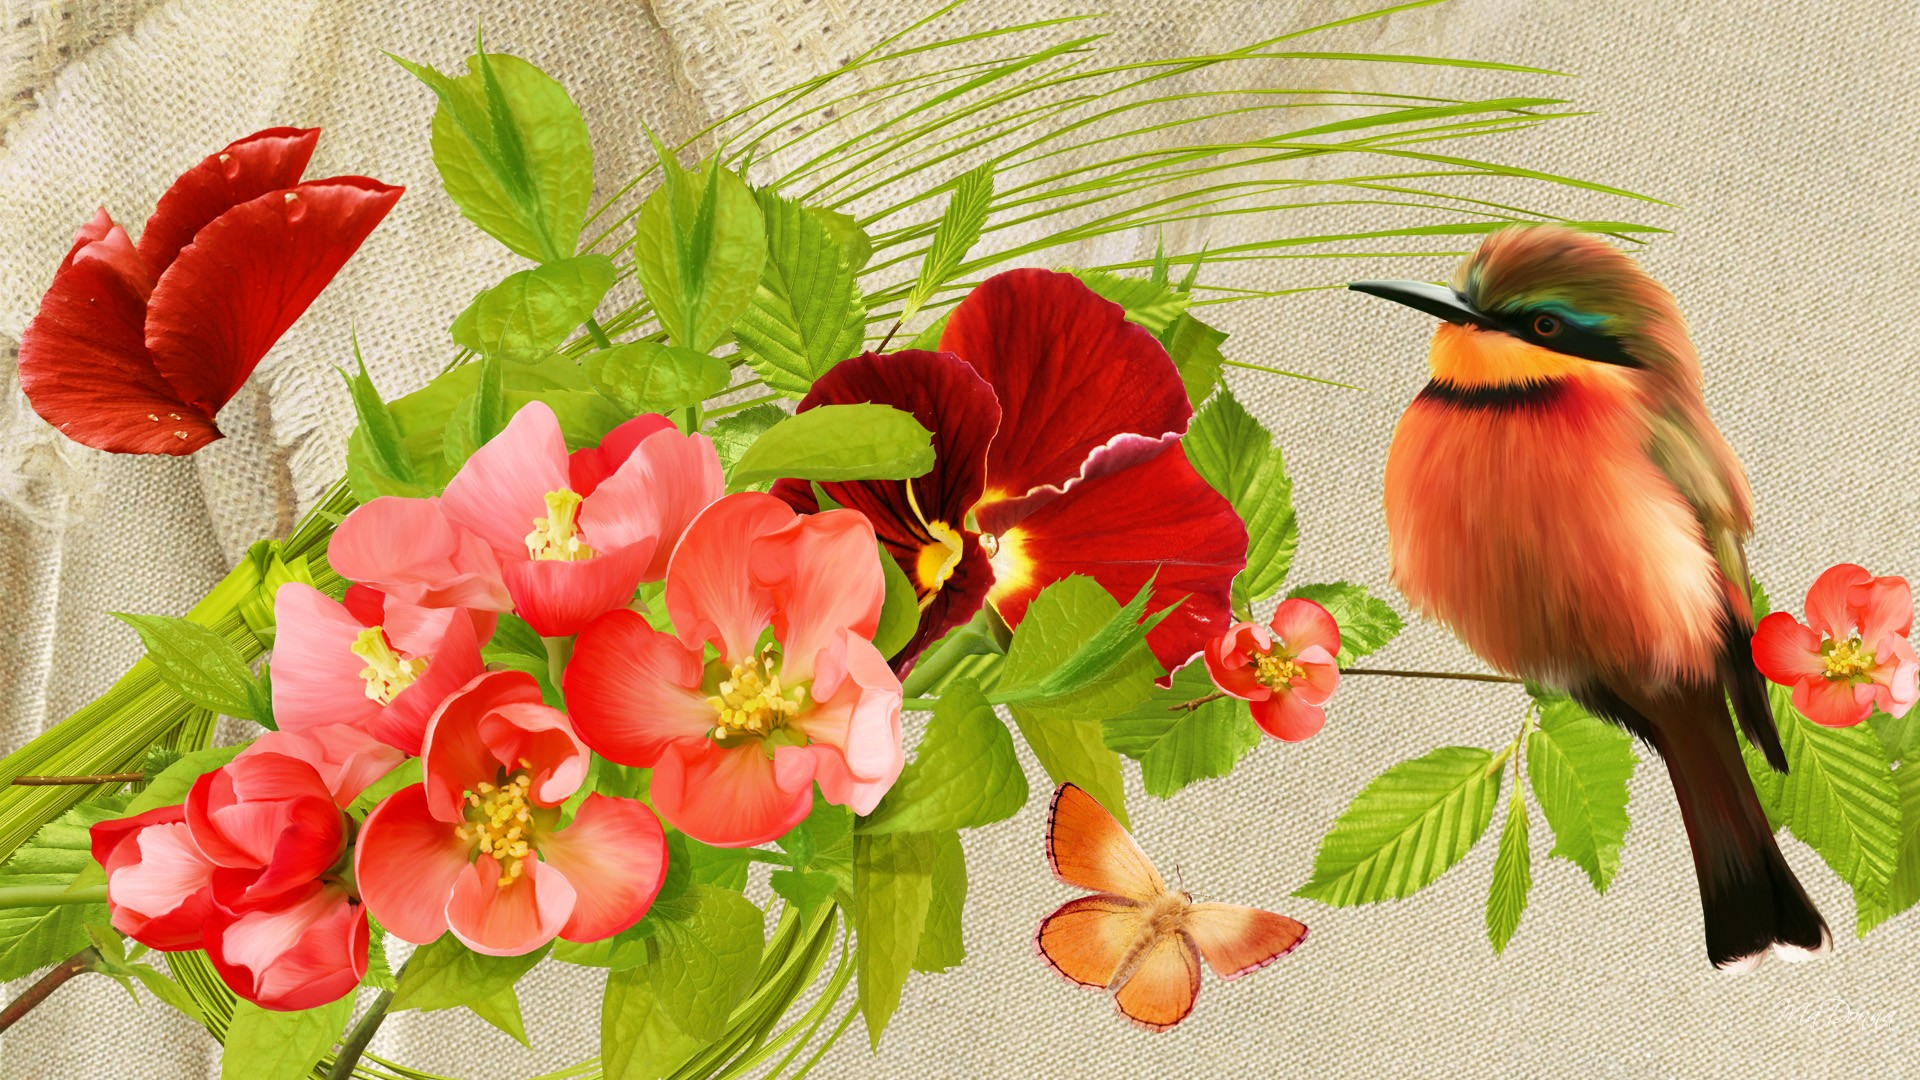 Pretty Birds Flowers wallpaper   ForWallpapercom 1920x1080